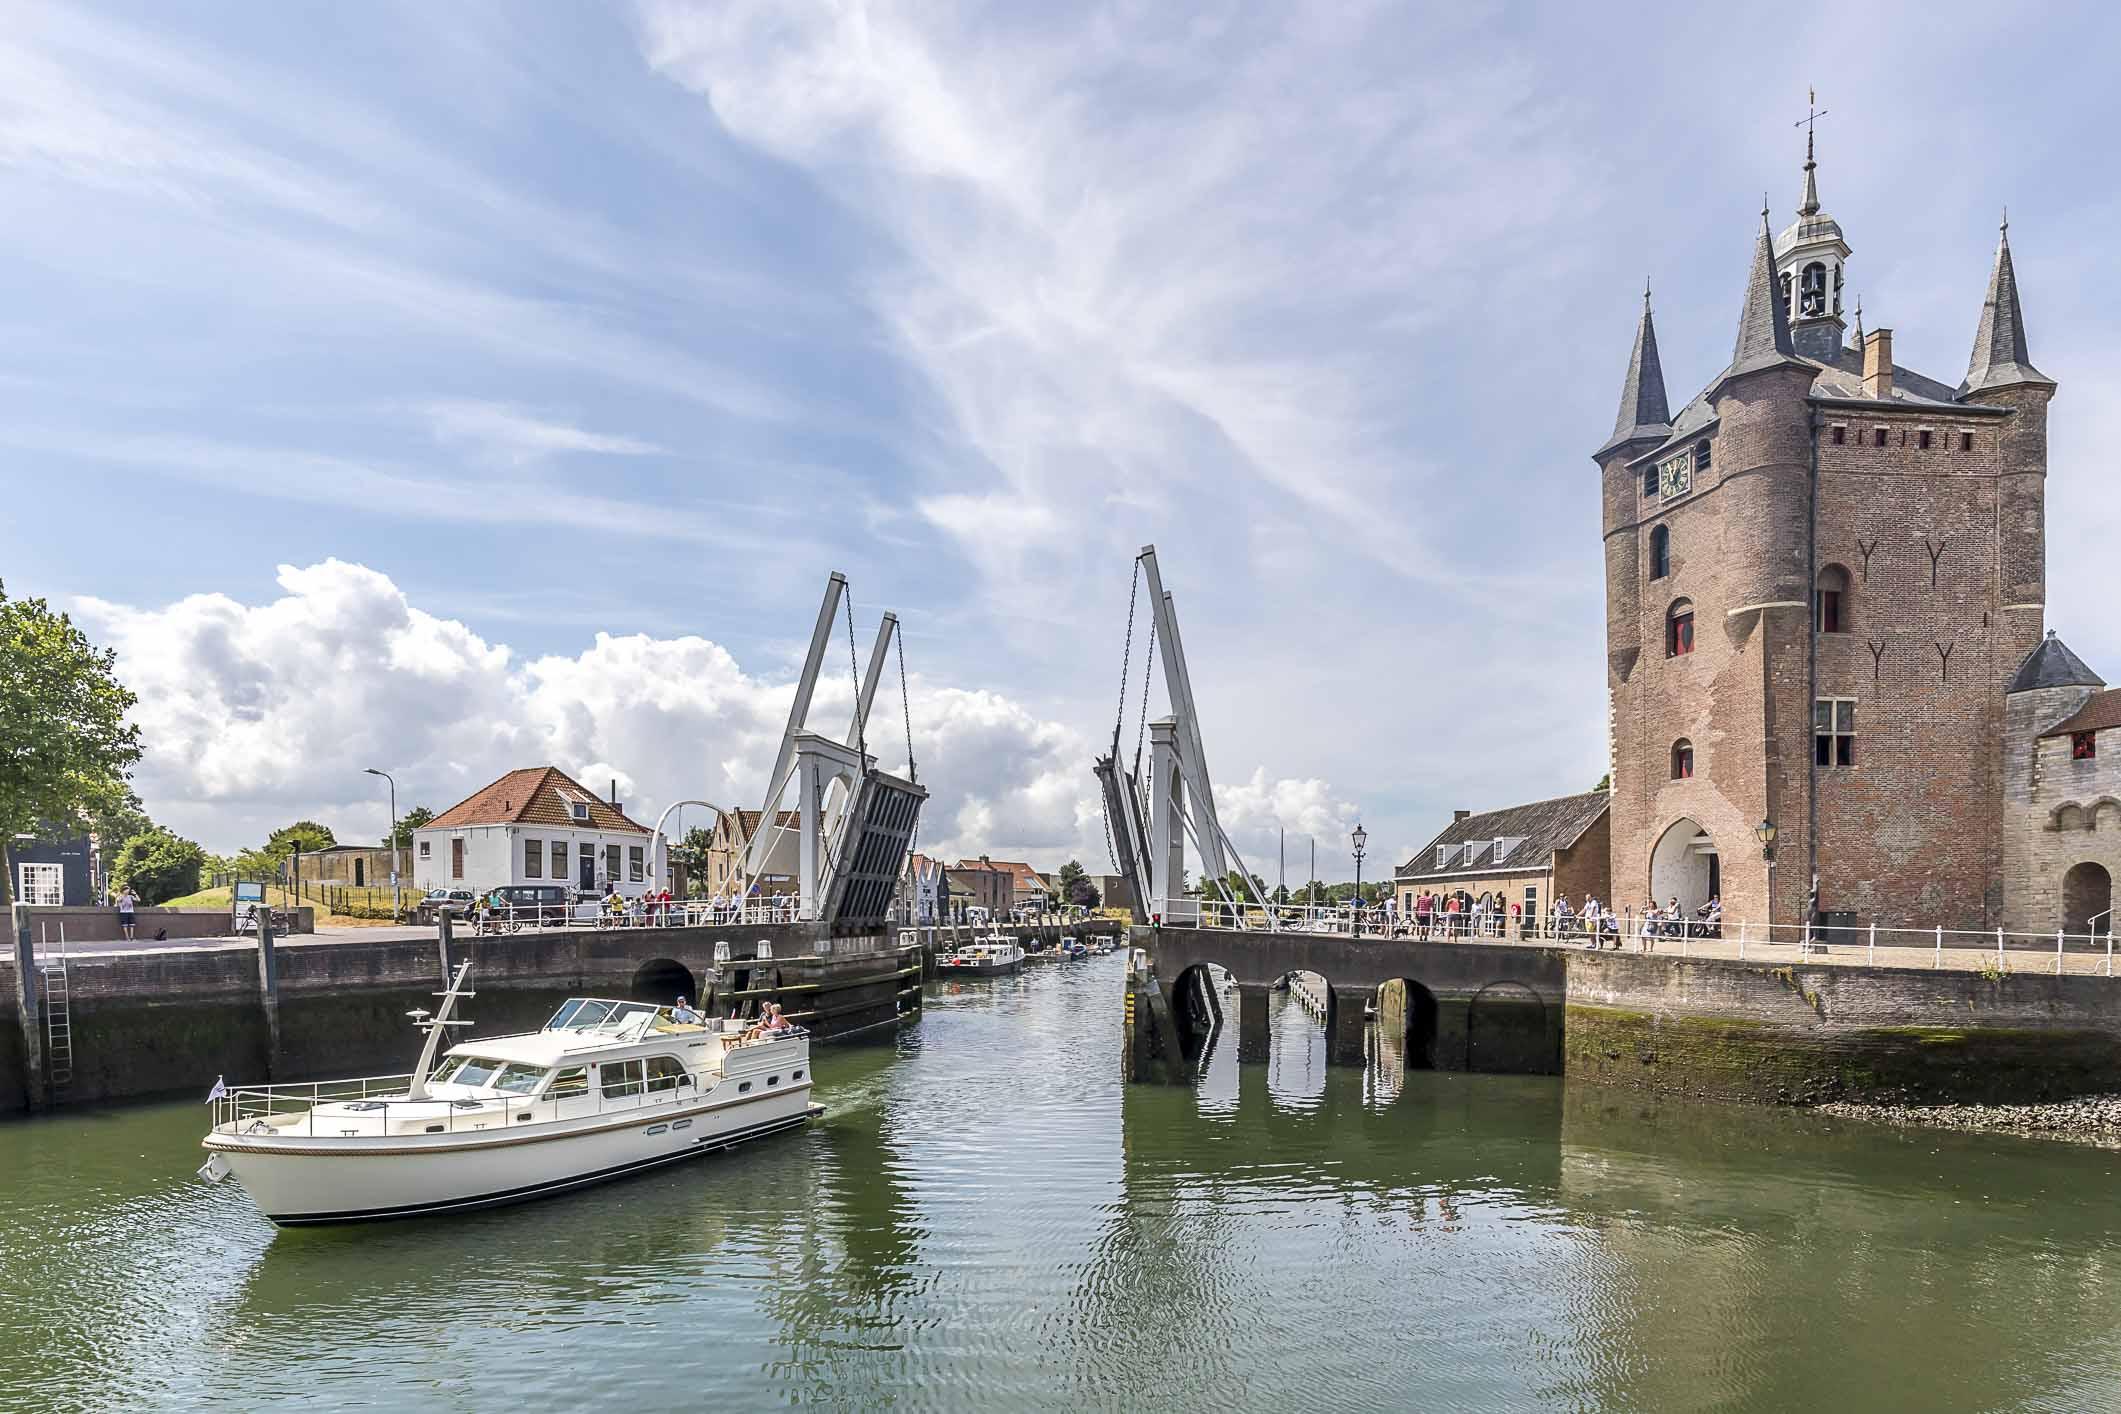 Route 1; Vlaanderen & Pas de Calais